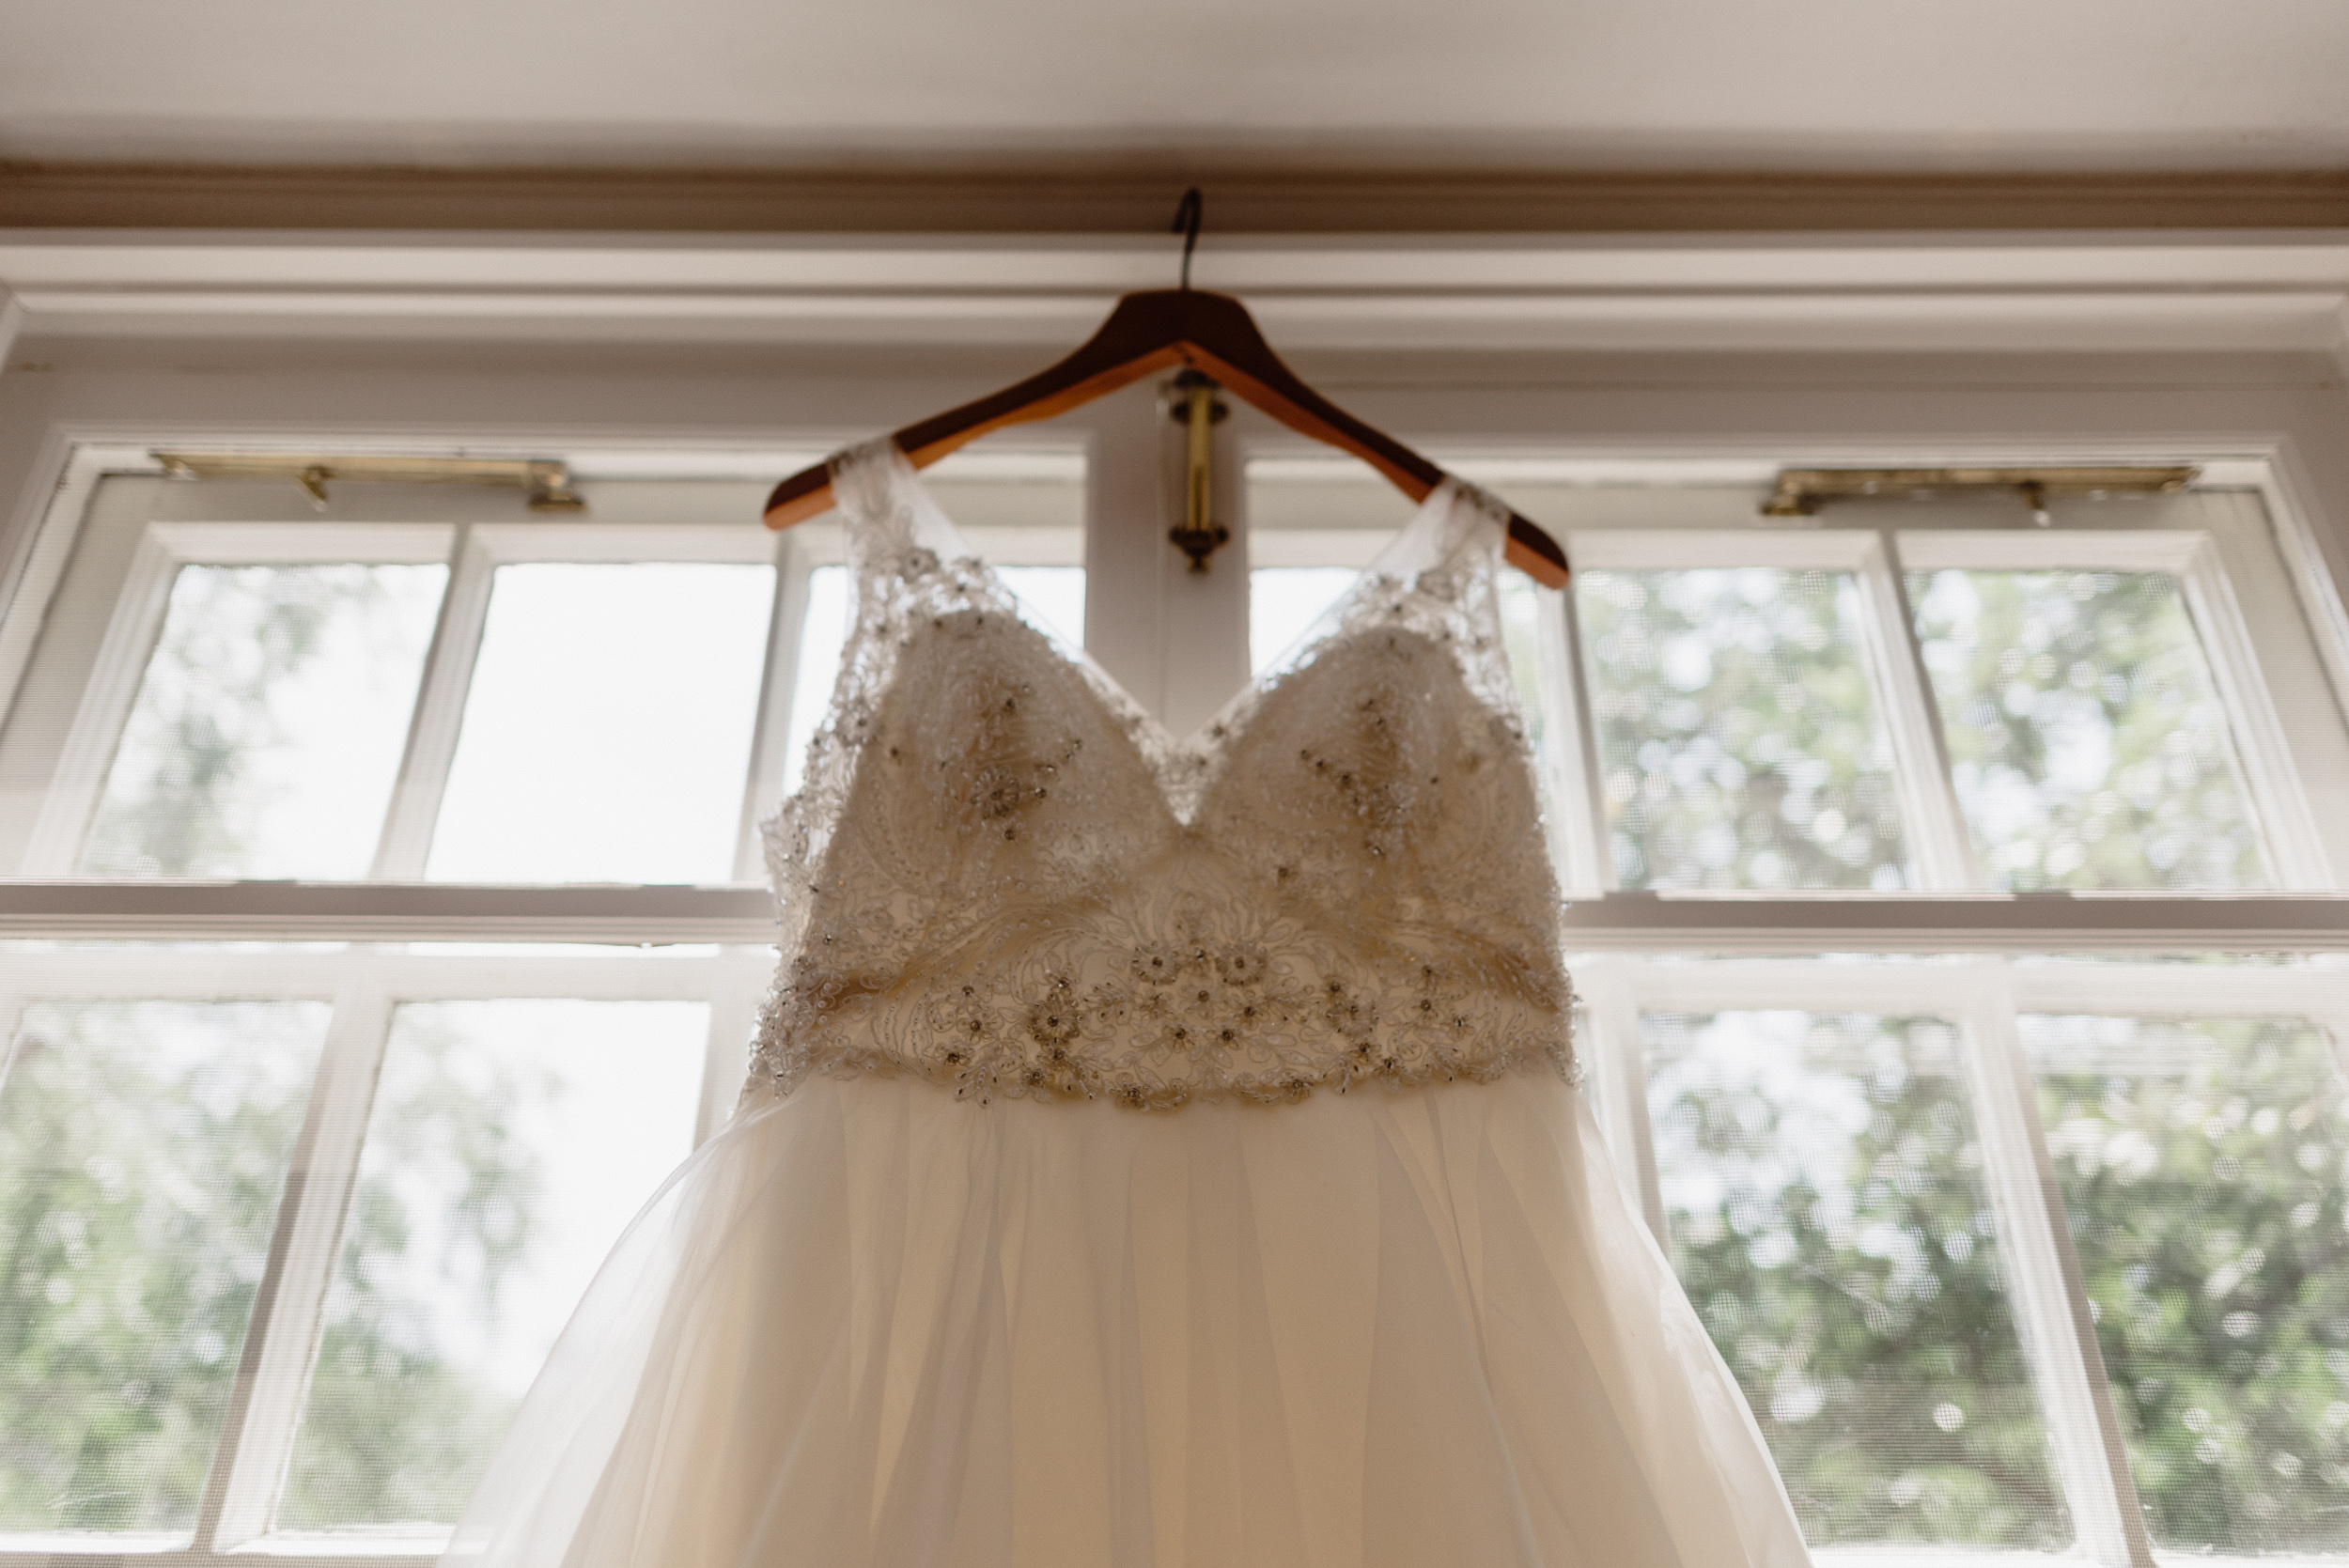 dc-baltimore-wedding-dress-hanging-photographer-megan-graham-photography-2018.jpg